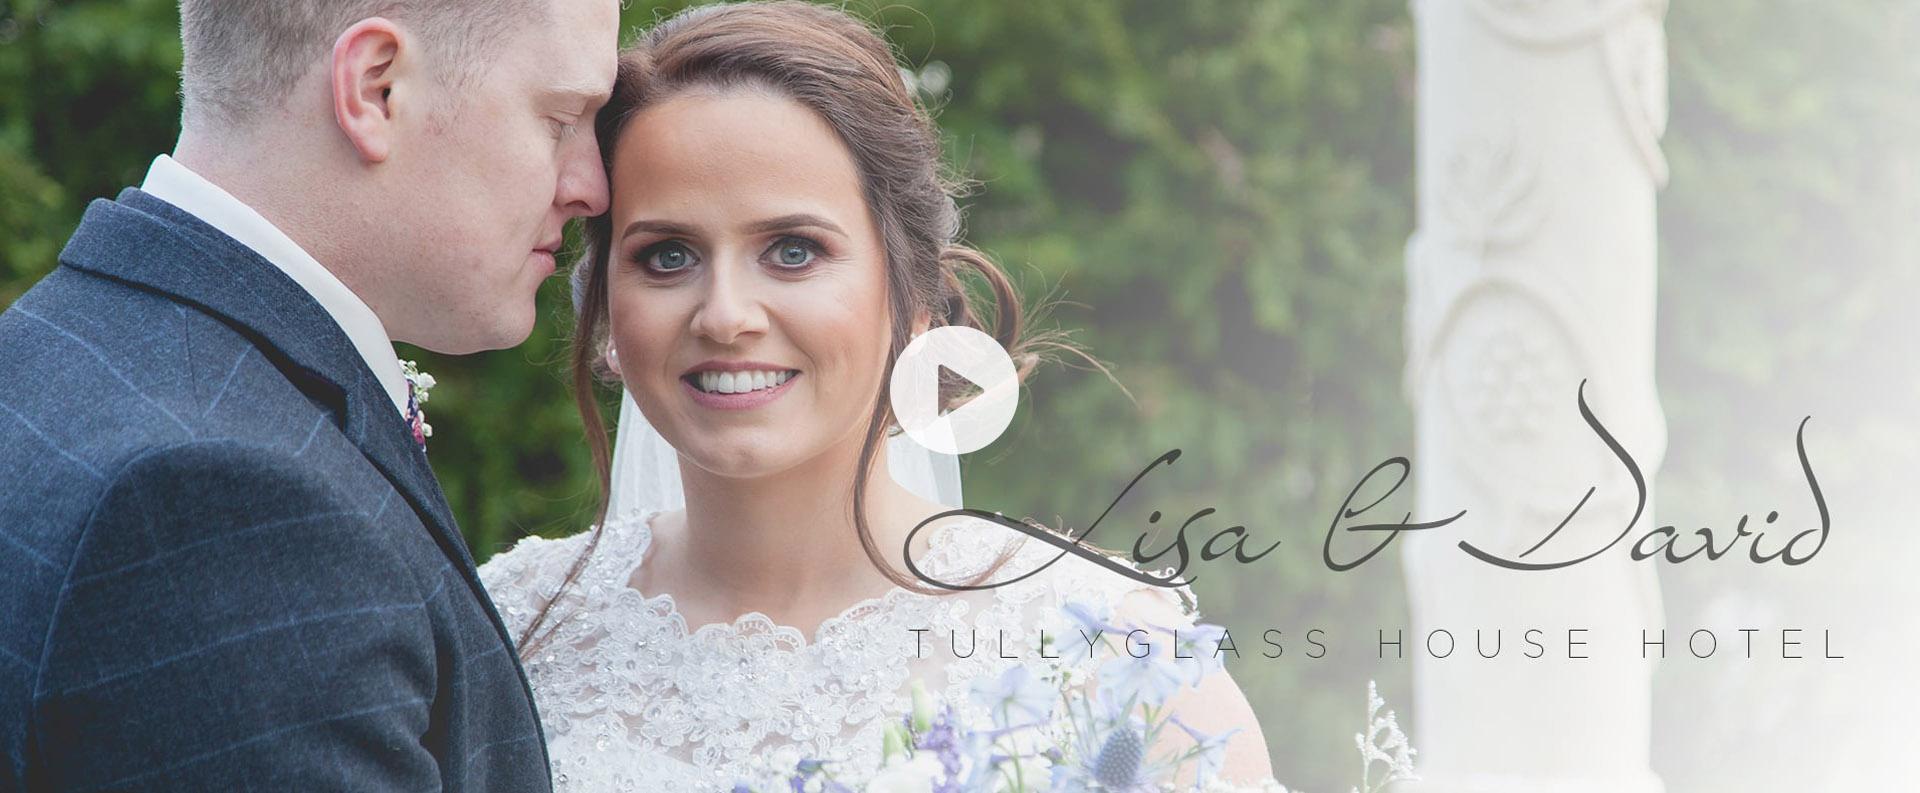 Lisa & David - Tullyglass House Hotel wedding video